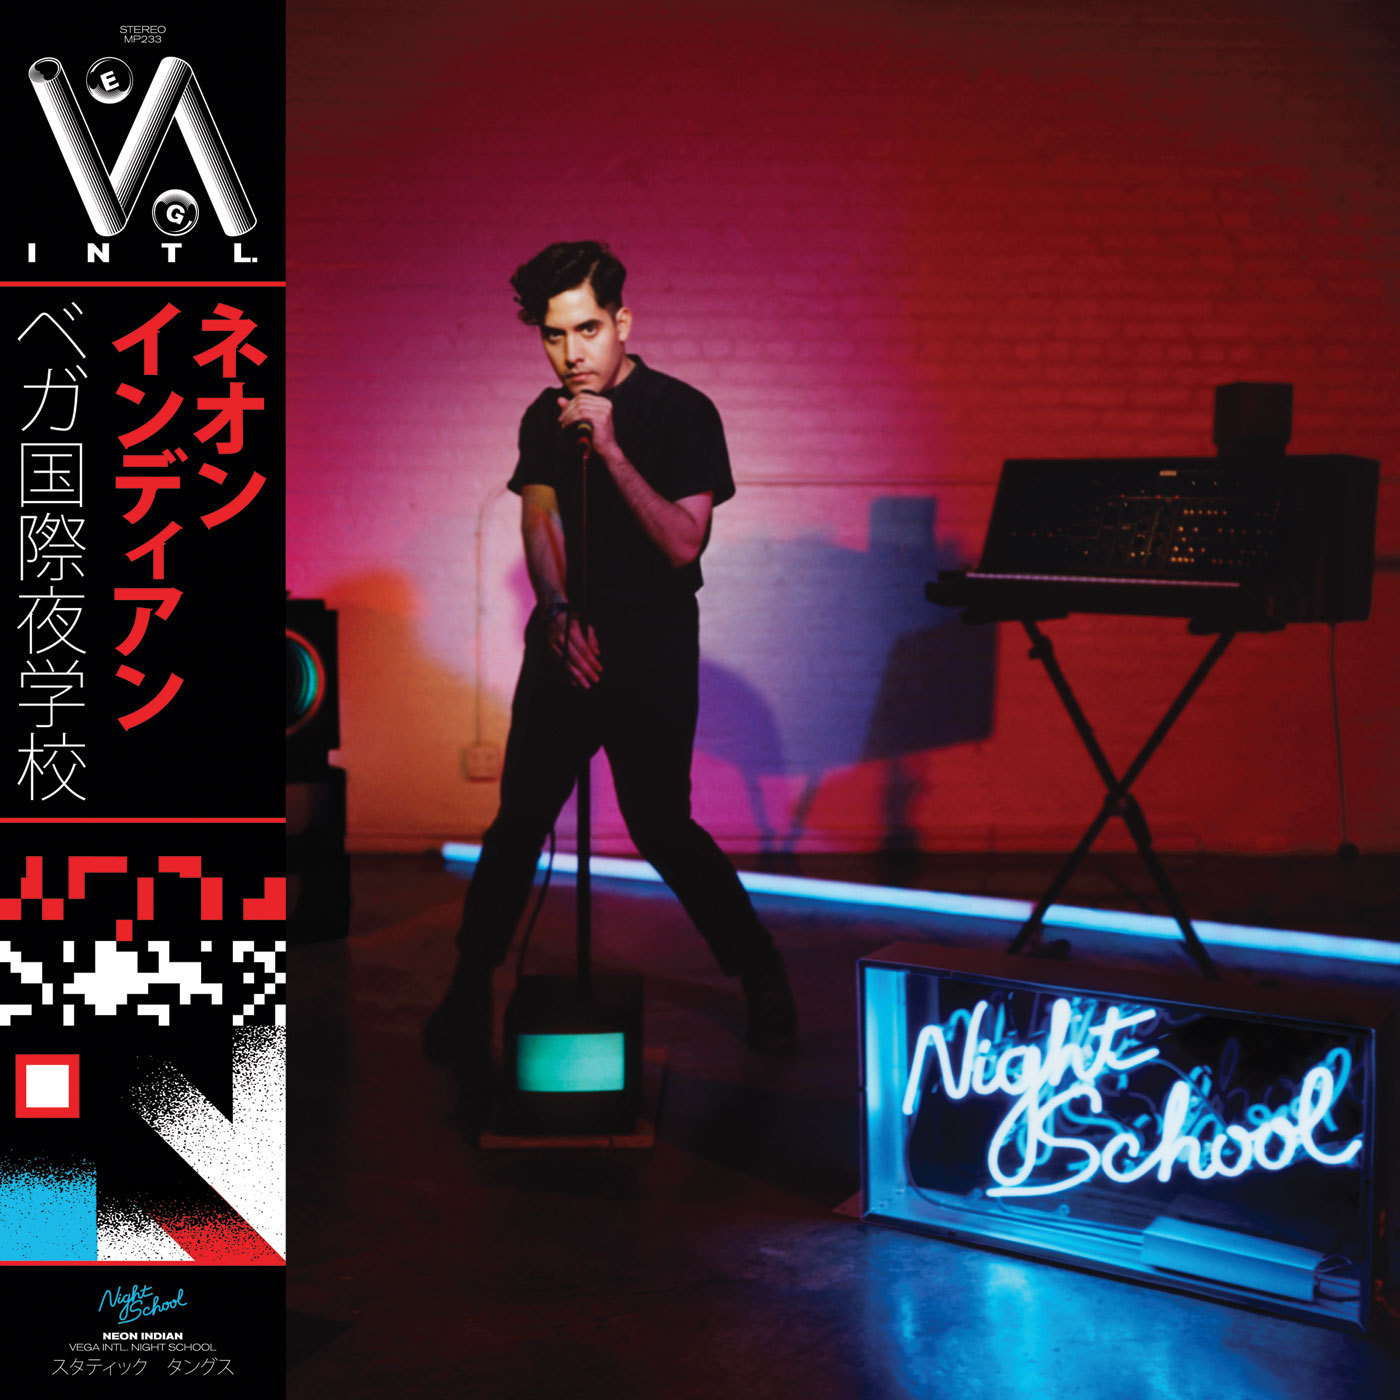 neon_indian_vega_intl_night_school.jpg